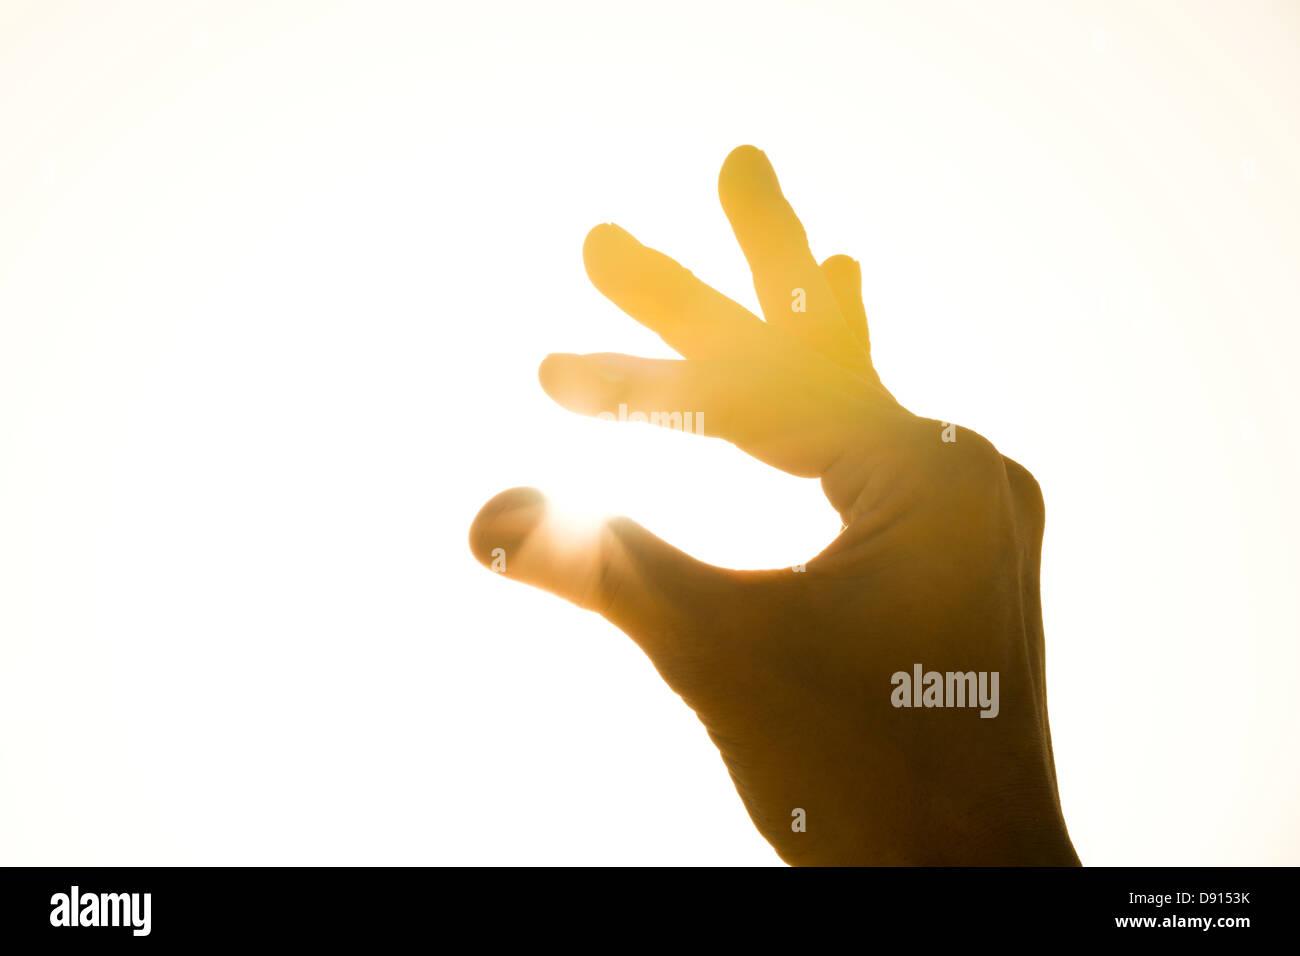 La mano humana la celebración de sun Imagen De Stock